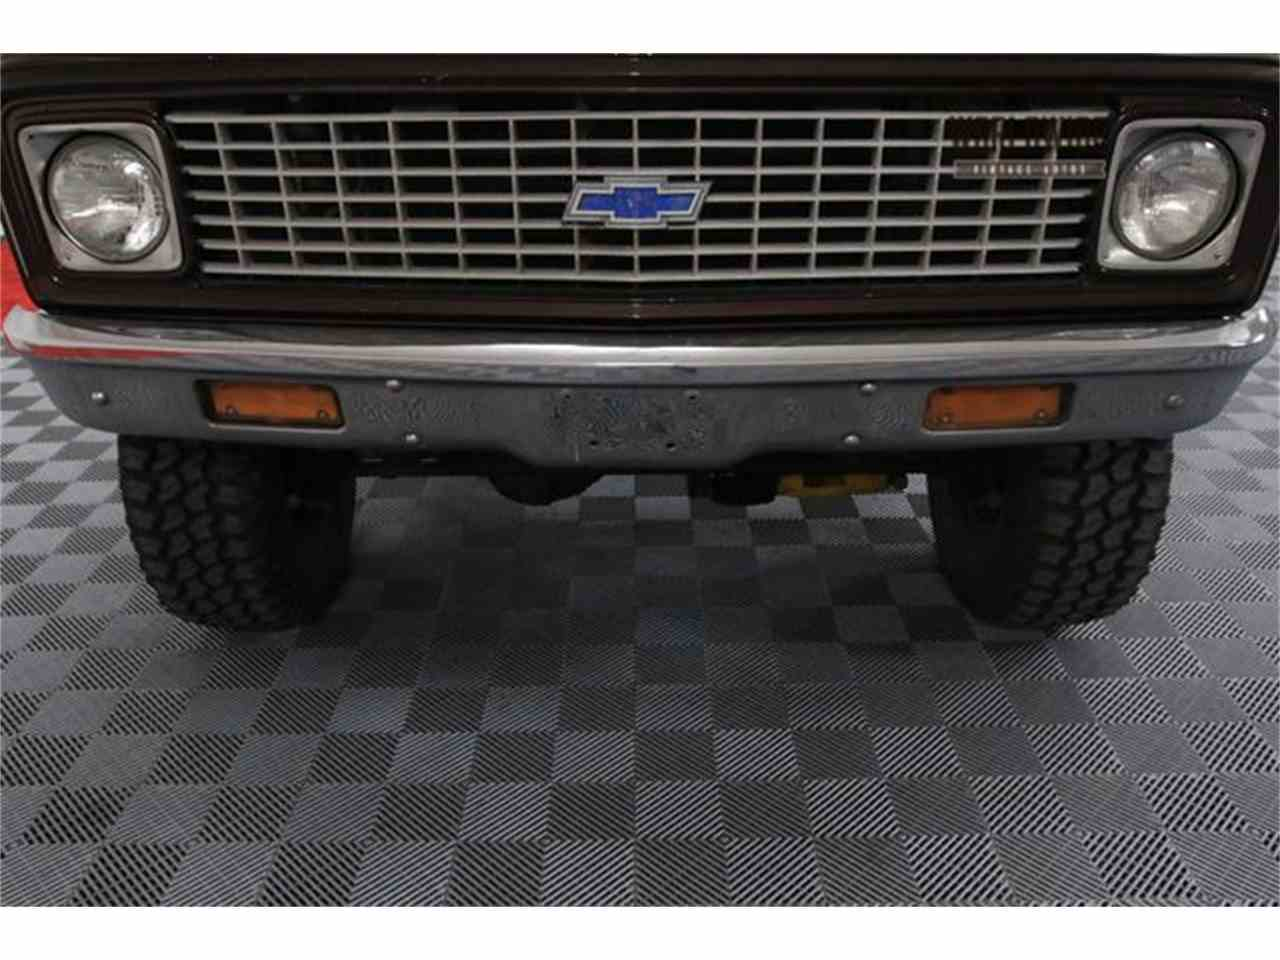 Large Picture of 1971 Chevrolet Blazer - $24,900.00 - LI5Q